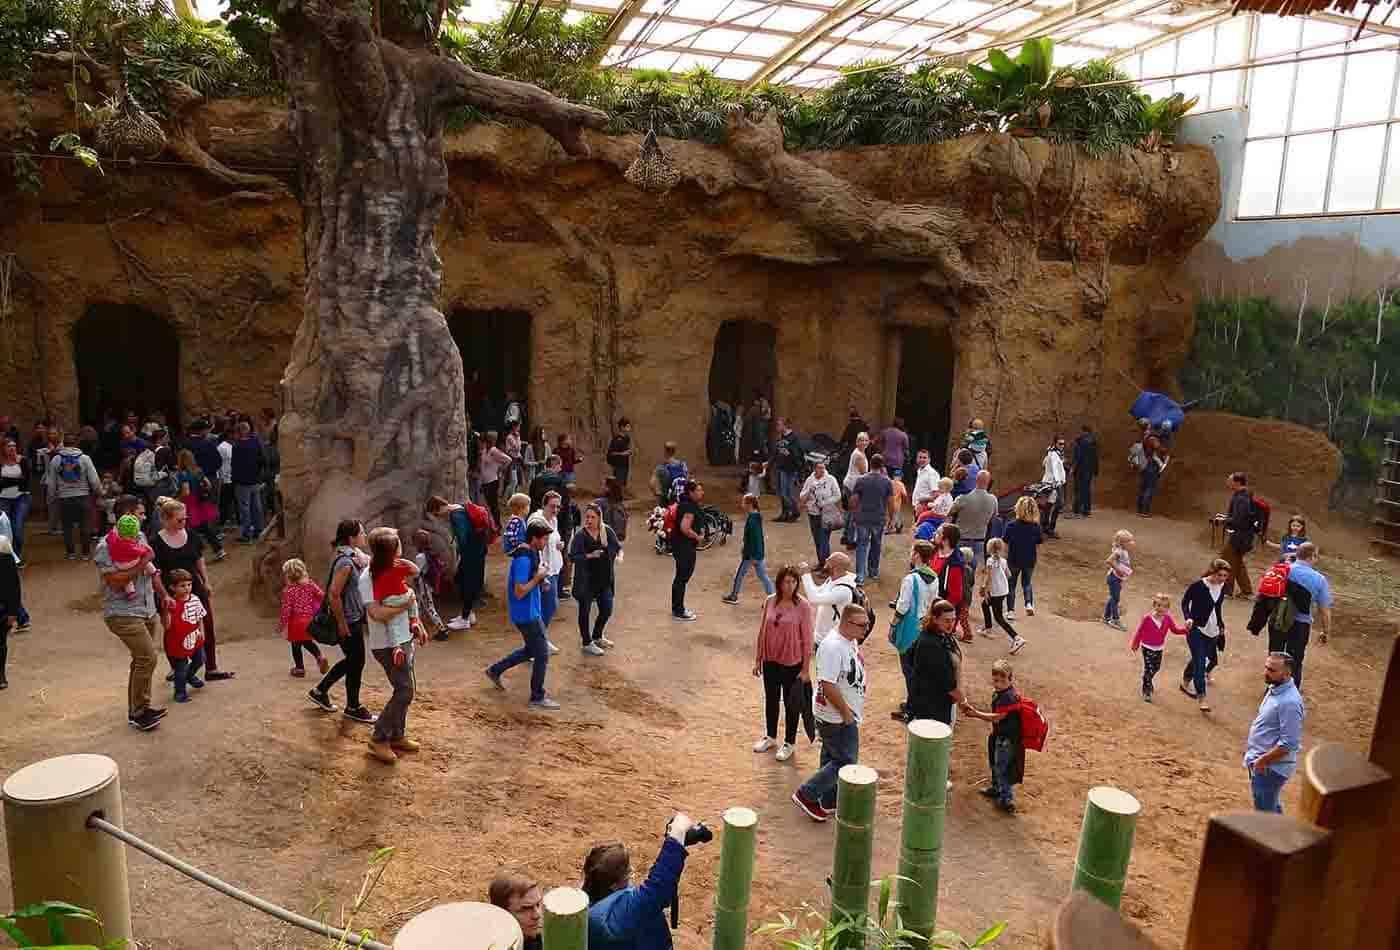 Sesam öffnet dich am 06. Oktober 2019 im Zoo Heidelberg (Foto: Zoo Heidelberg)